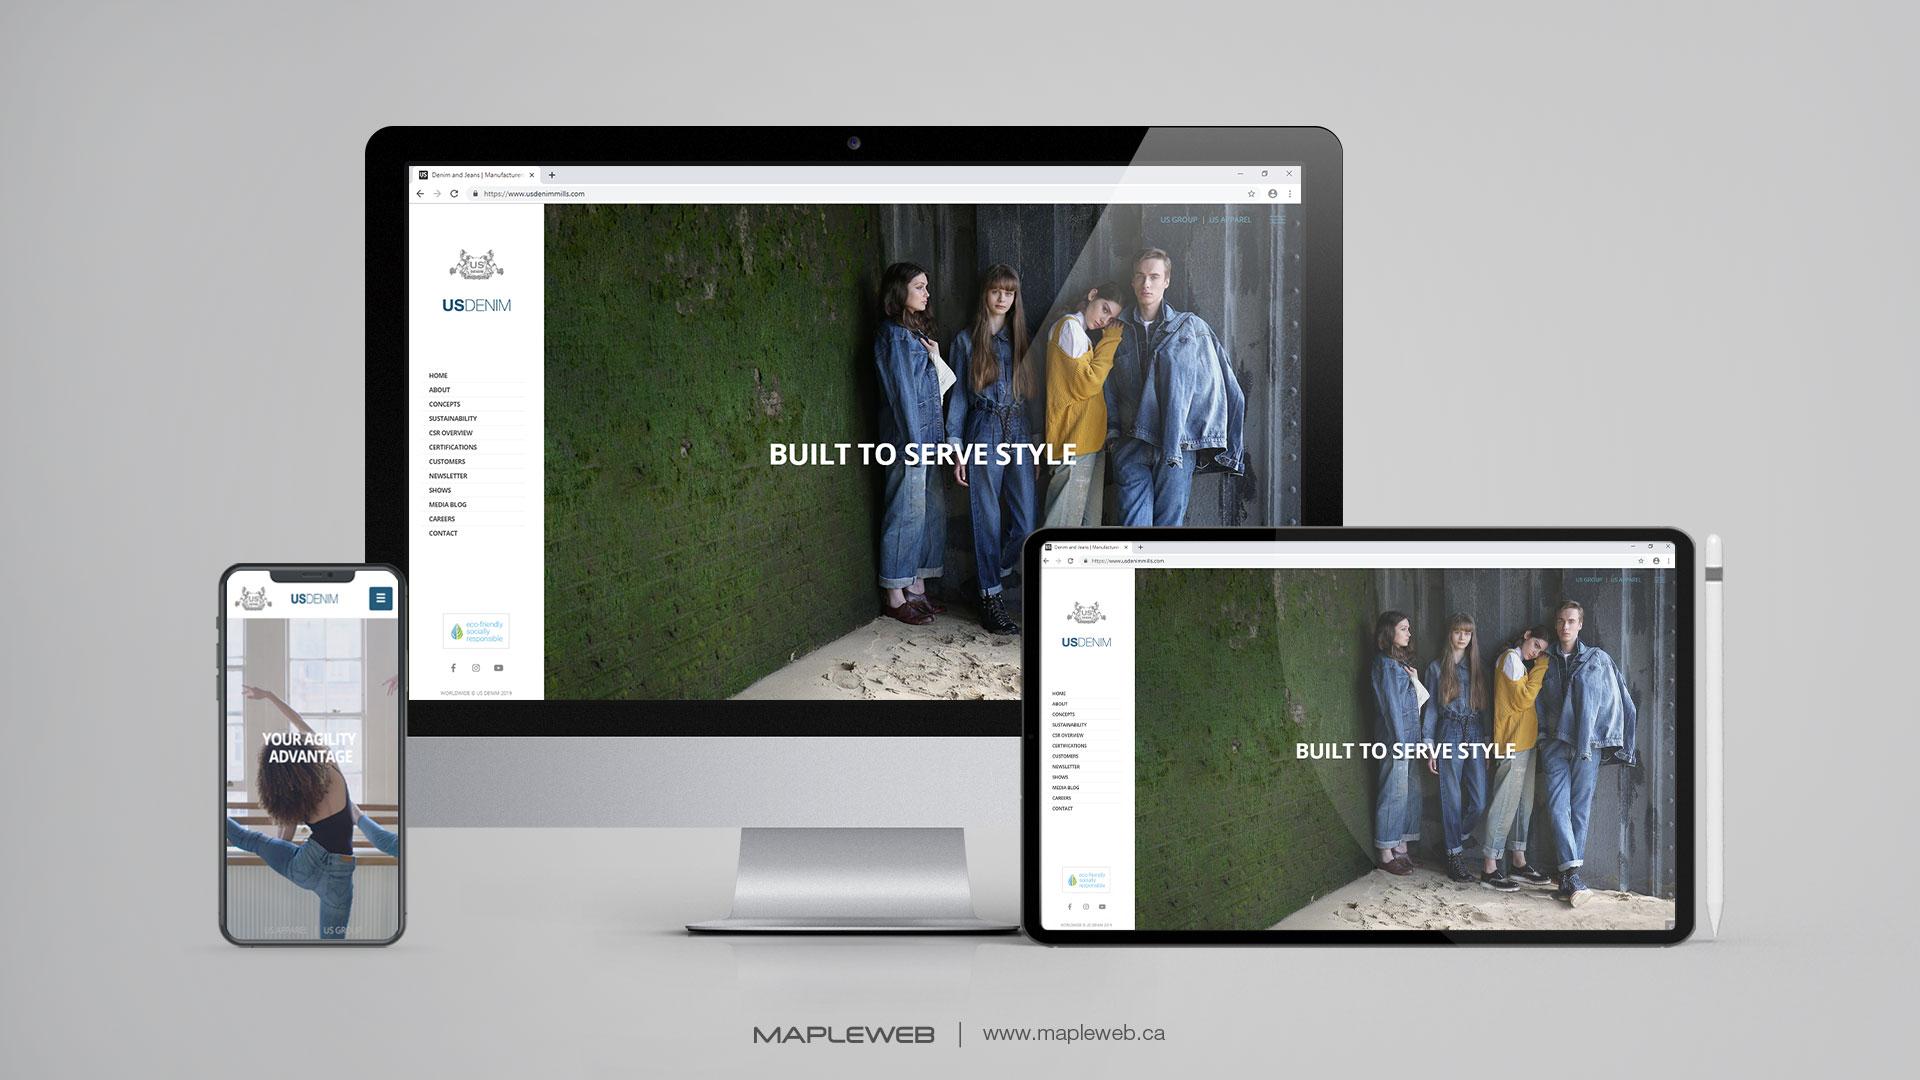 us-denim-Vancouver-web-design-Vancouver-web-development-by-mapleweb-canada-multiple-devices-display